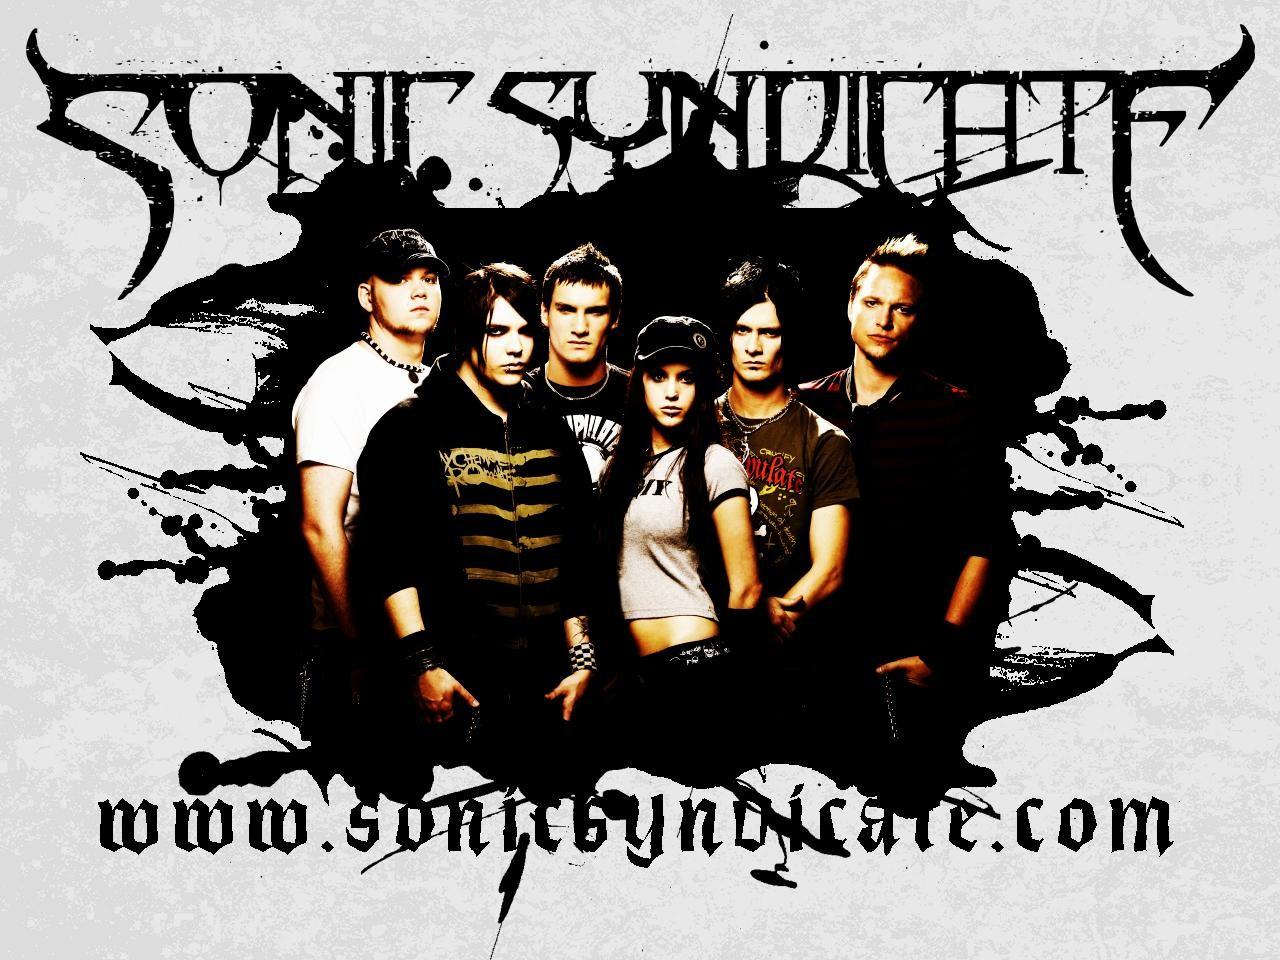 Sonic Syndicate乐队经典壁纸